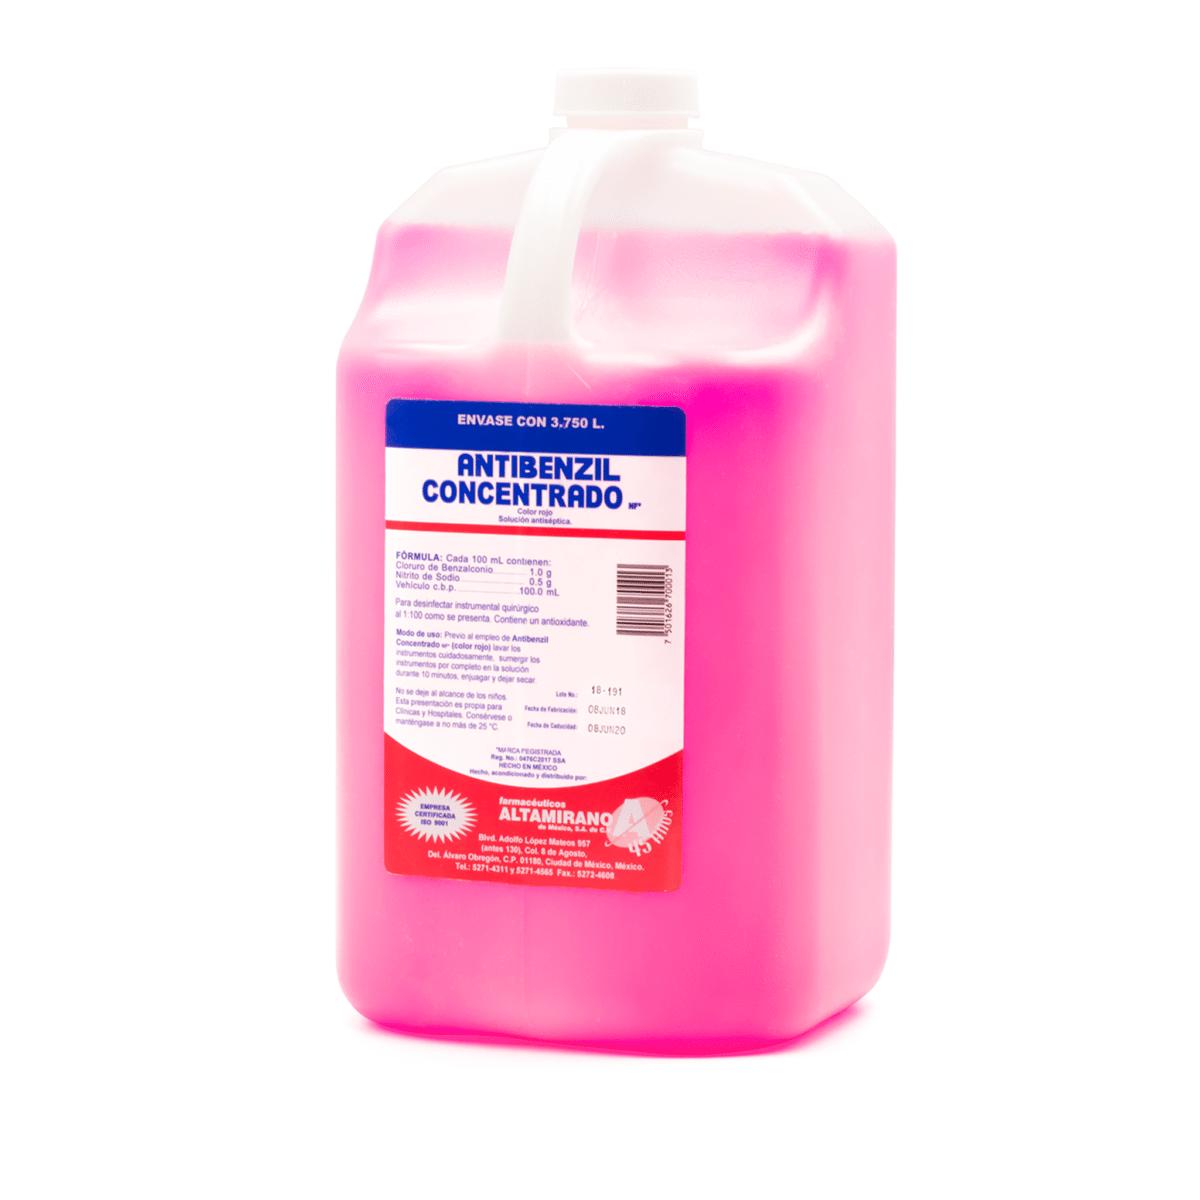 Antibenzil Concentrado Rojo -Marca: Altamirano Esterilización   Odontology BG